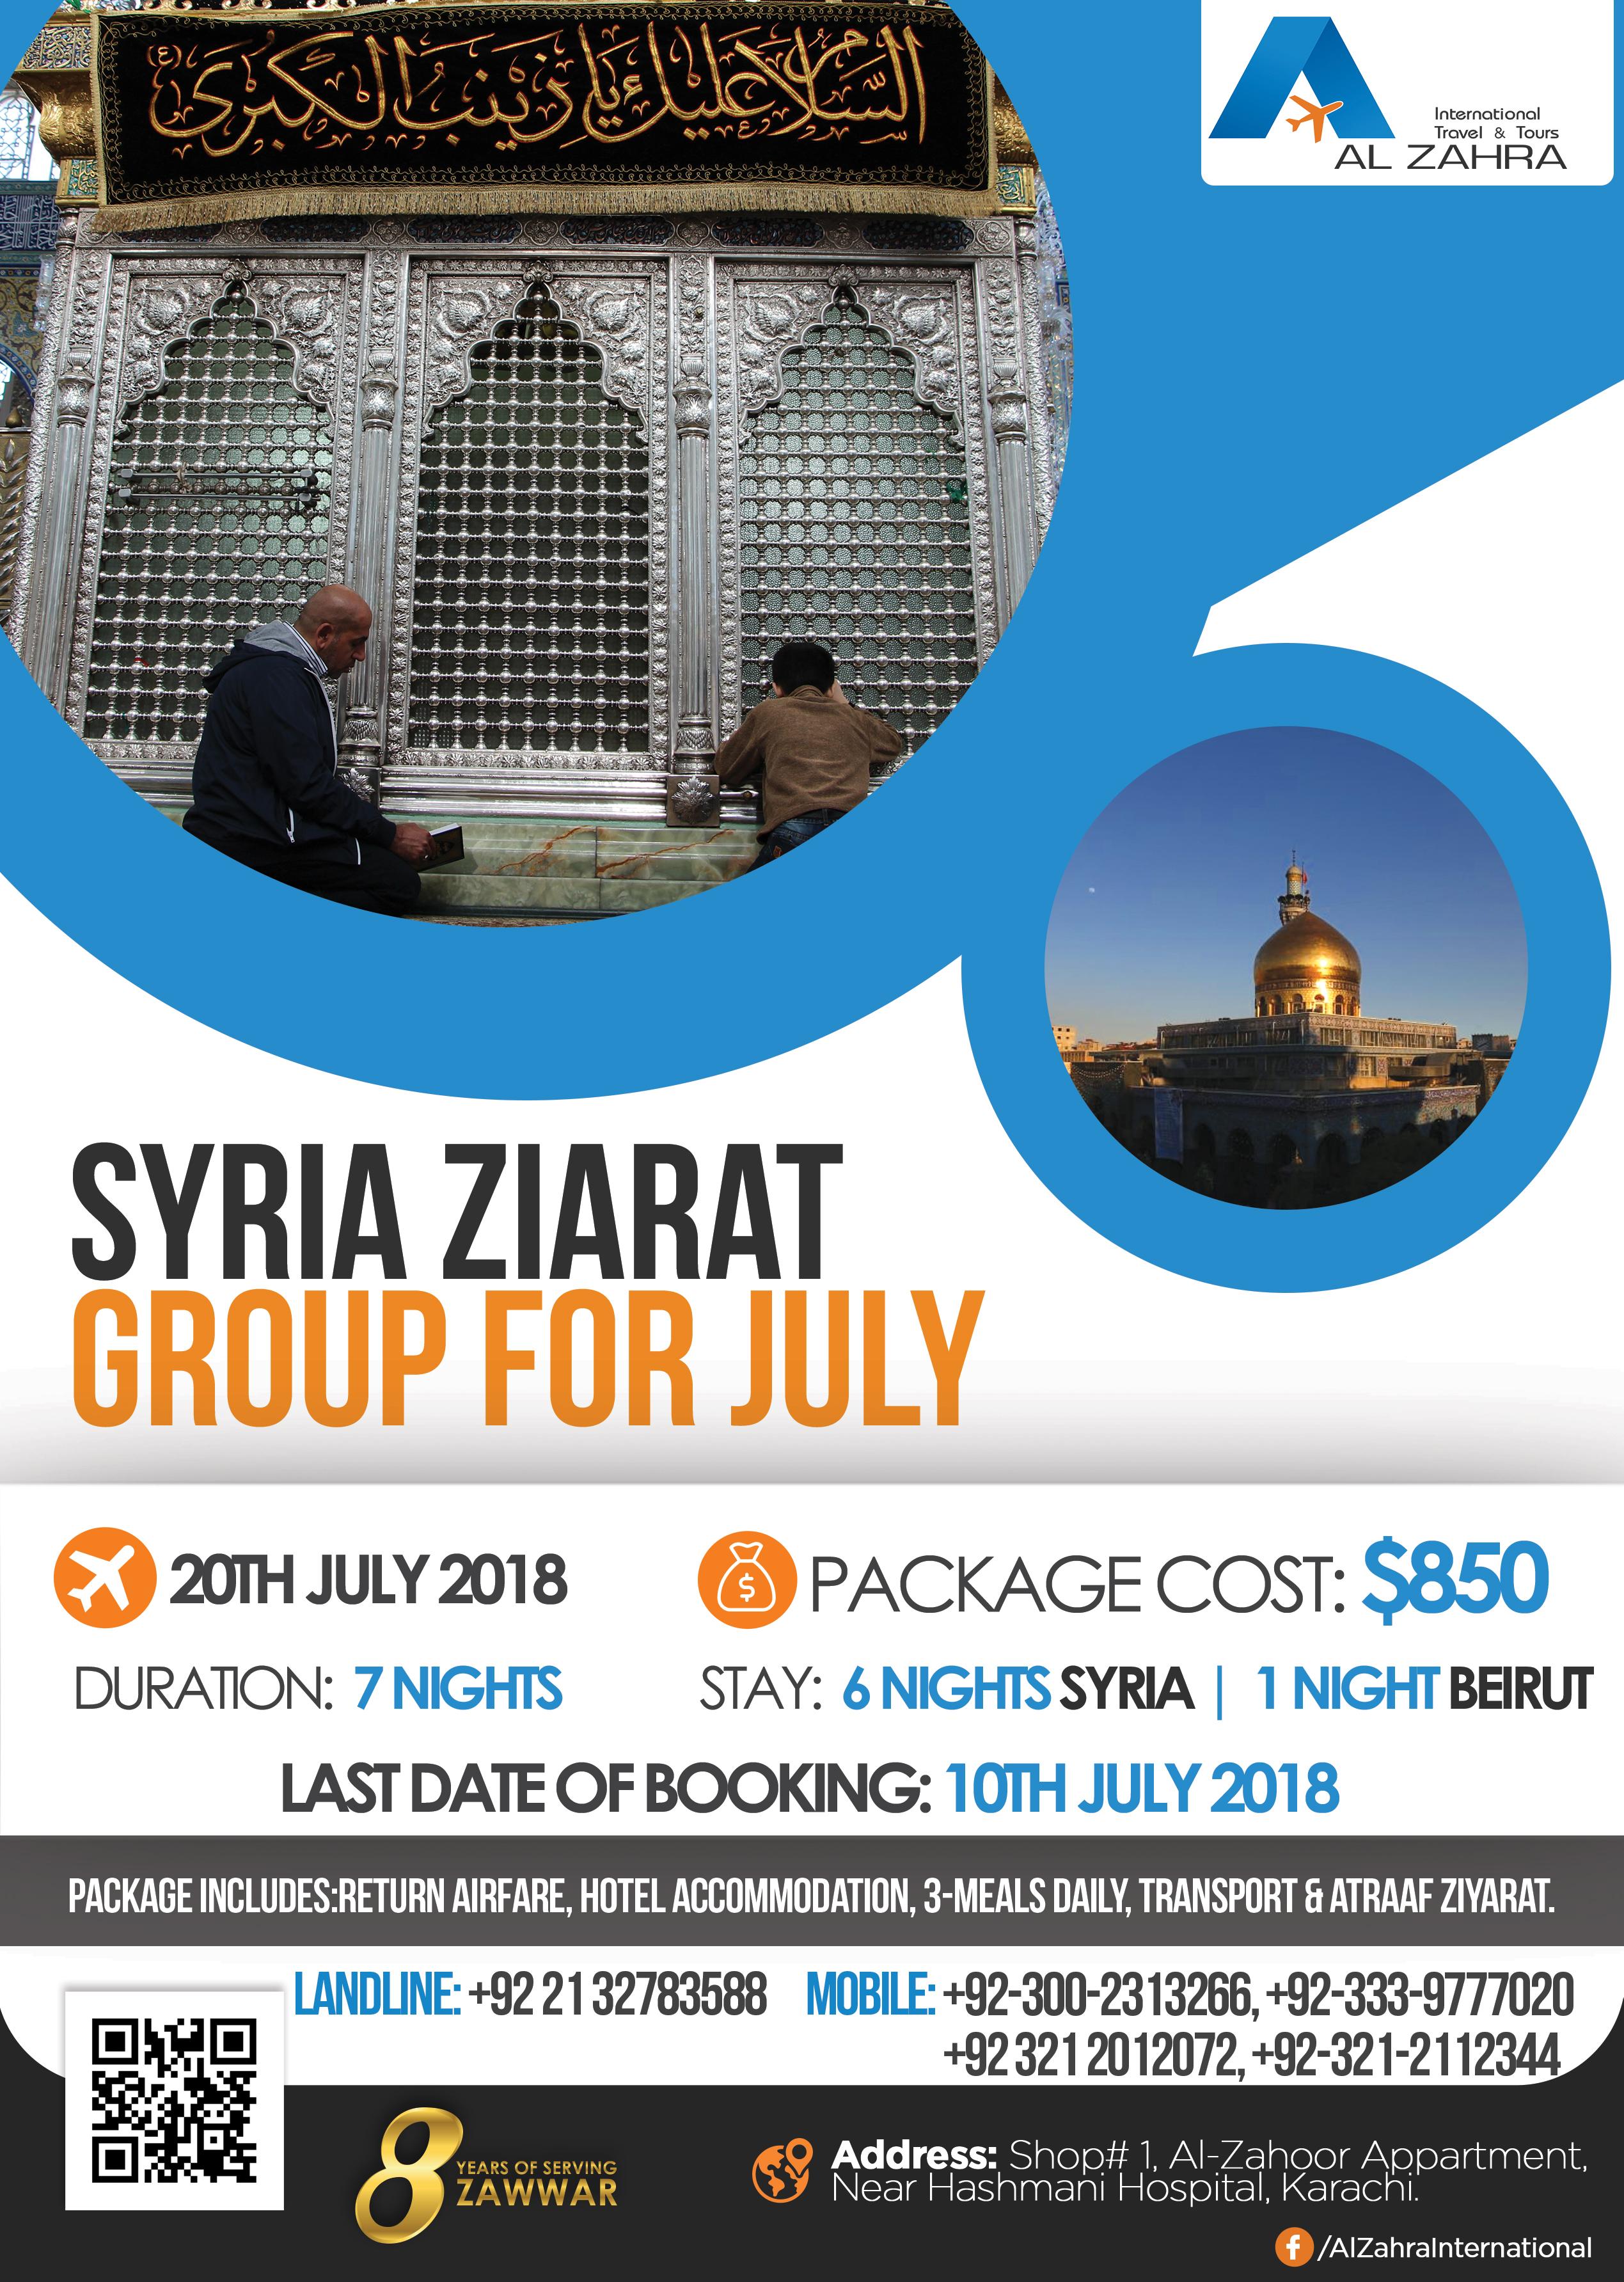 Syria Ziarat Group For July Handbil Al Zahra Travel Tours